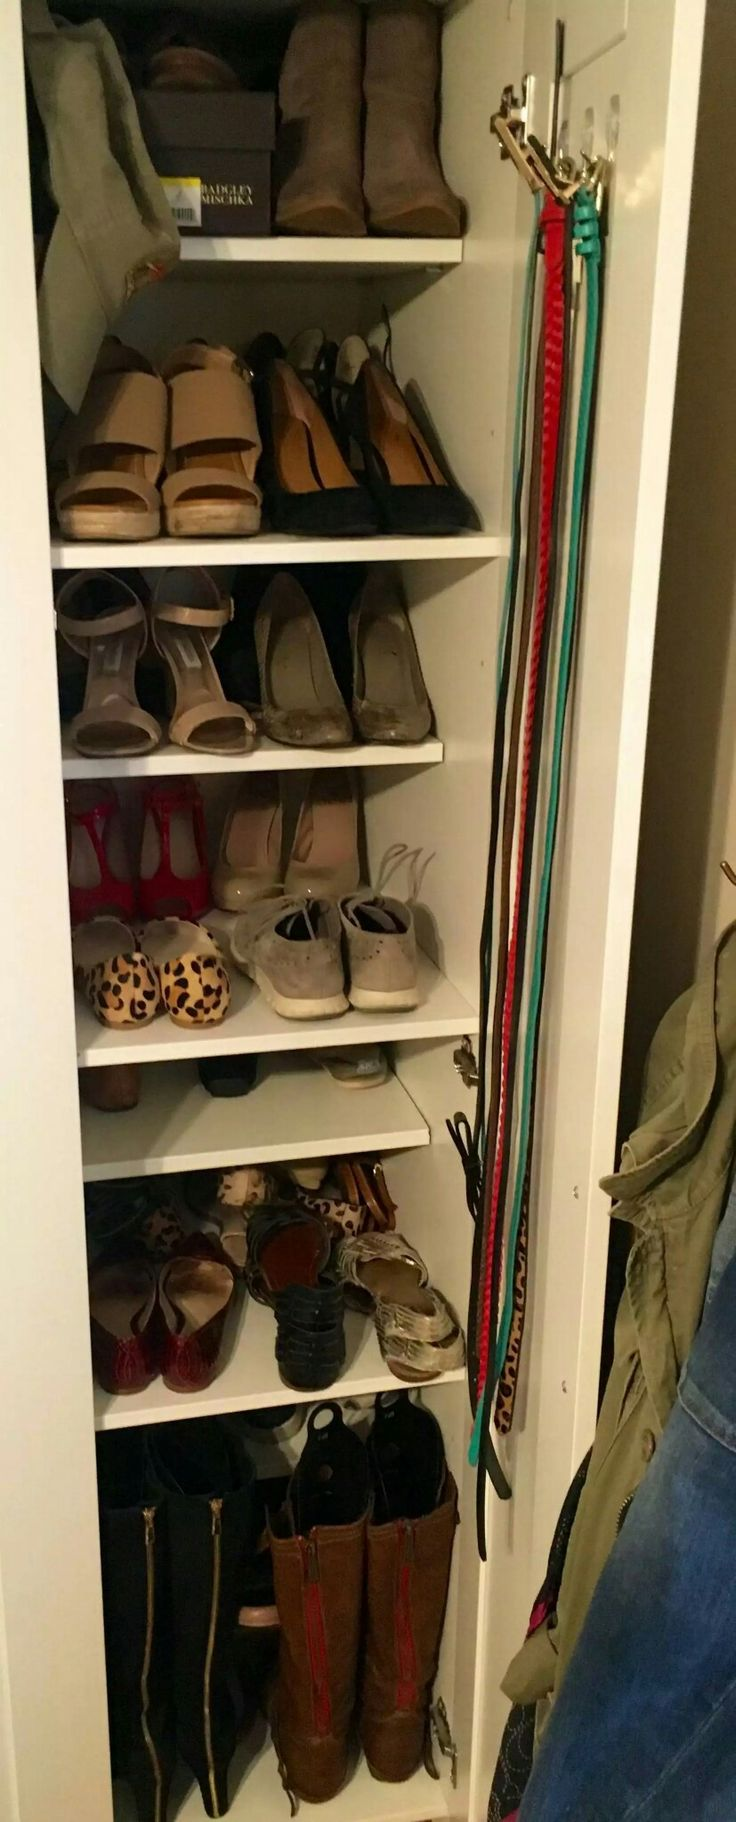 Brimnes 3 Door Wardrobe Hack Add Extra Shelves Comments At Https://m.